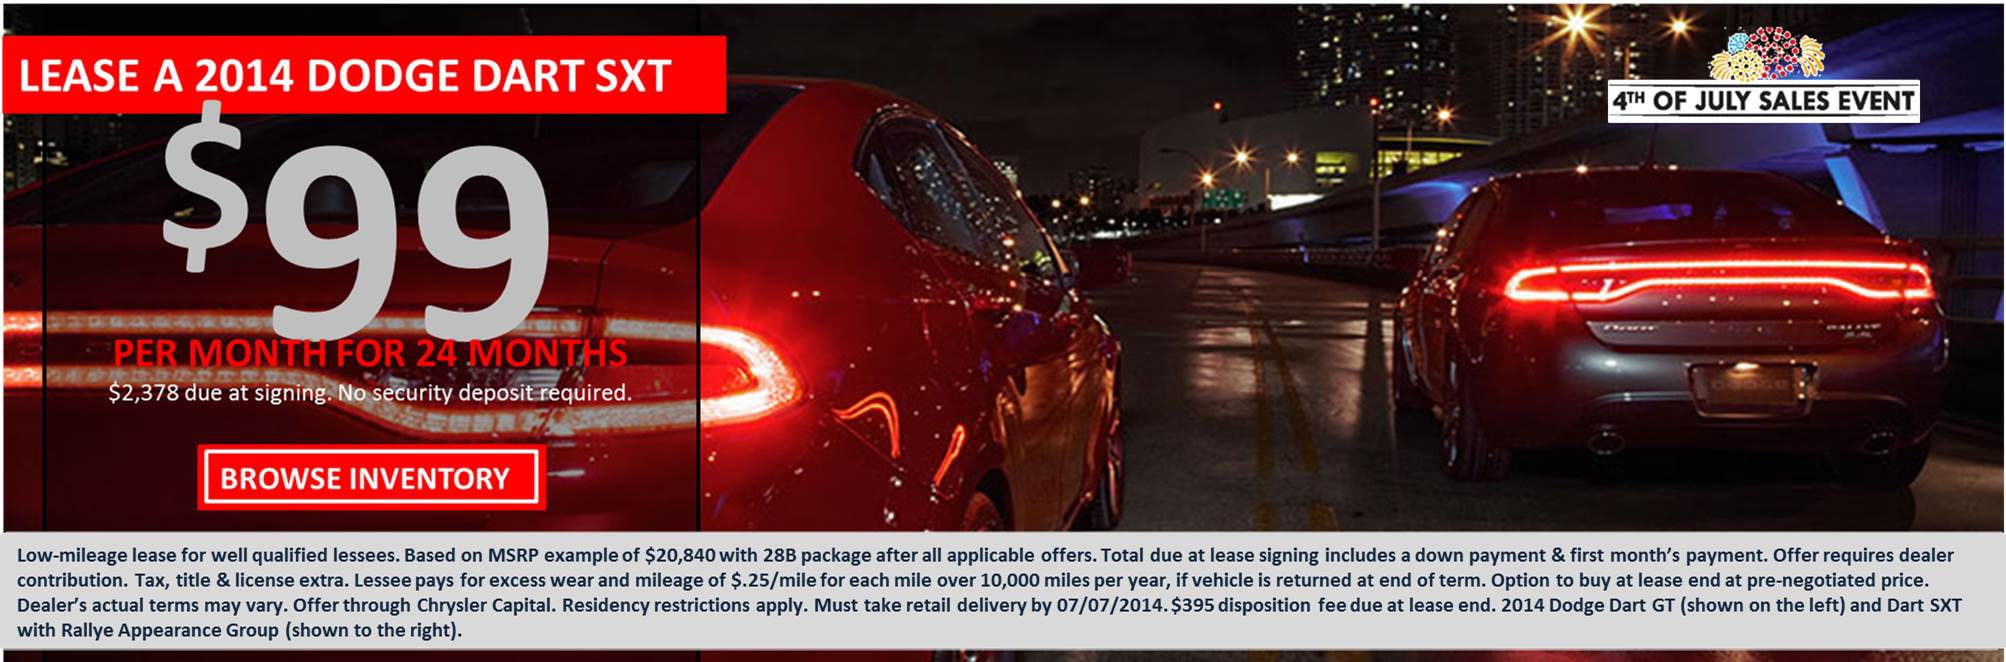 Larry H Miller Dodge Peoria Dodge Ram Dealer Near